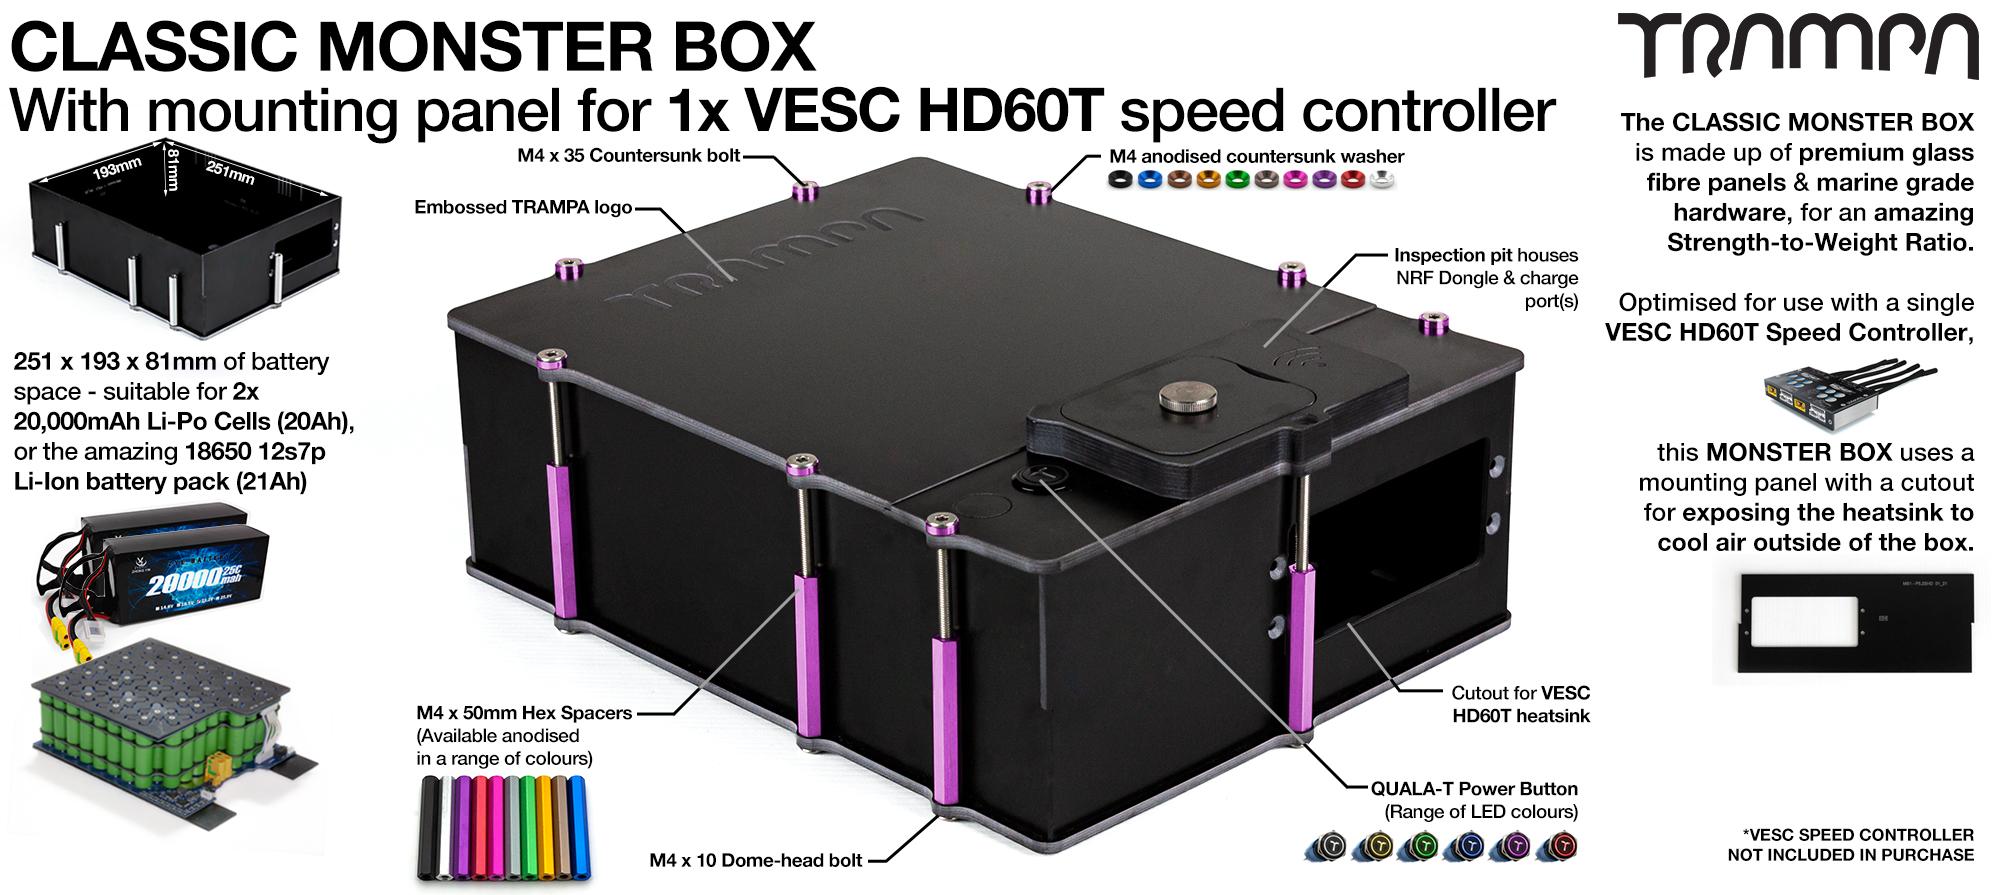 Classic MONSTER Box MkIV fits 84x 18650 cells or 2x22000 mAh Lipos & has Panels to fit 1x VESC HD-60T internally.